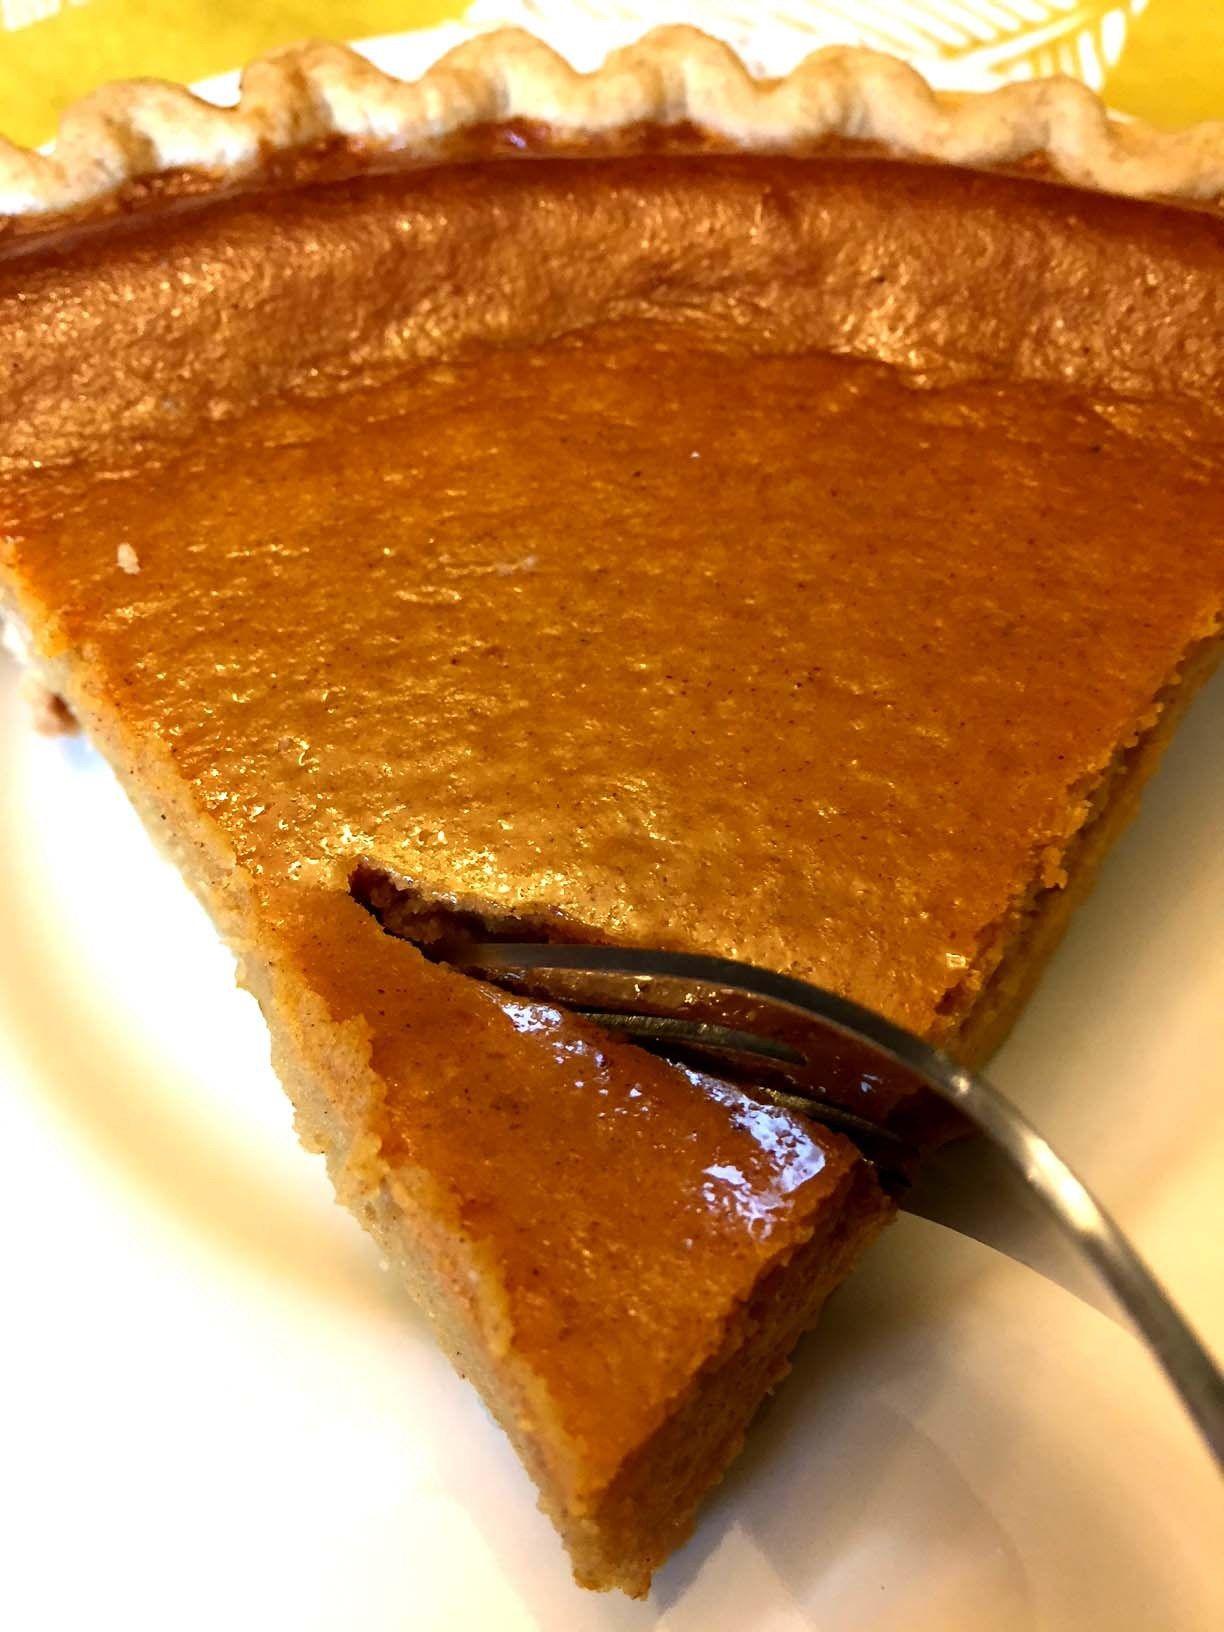 Easy Pumpkin Pie Recipe With Sweetened Condensed Milk Recipe In 2020 Pumpkin Pie Recipes Pumpkin Pie Recipe Easy Easy Pumpkin Pie